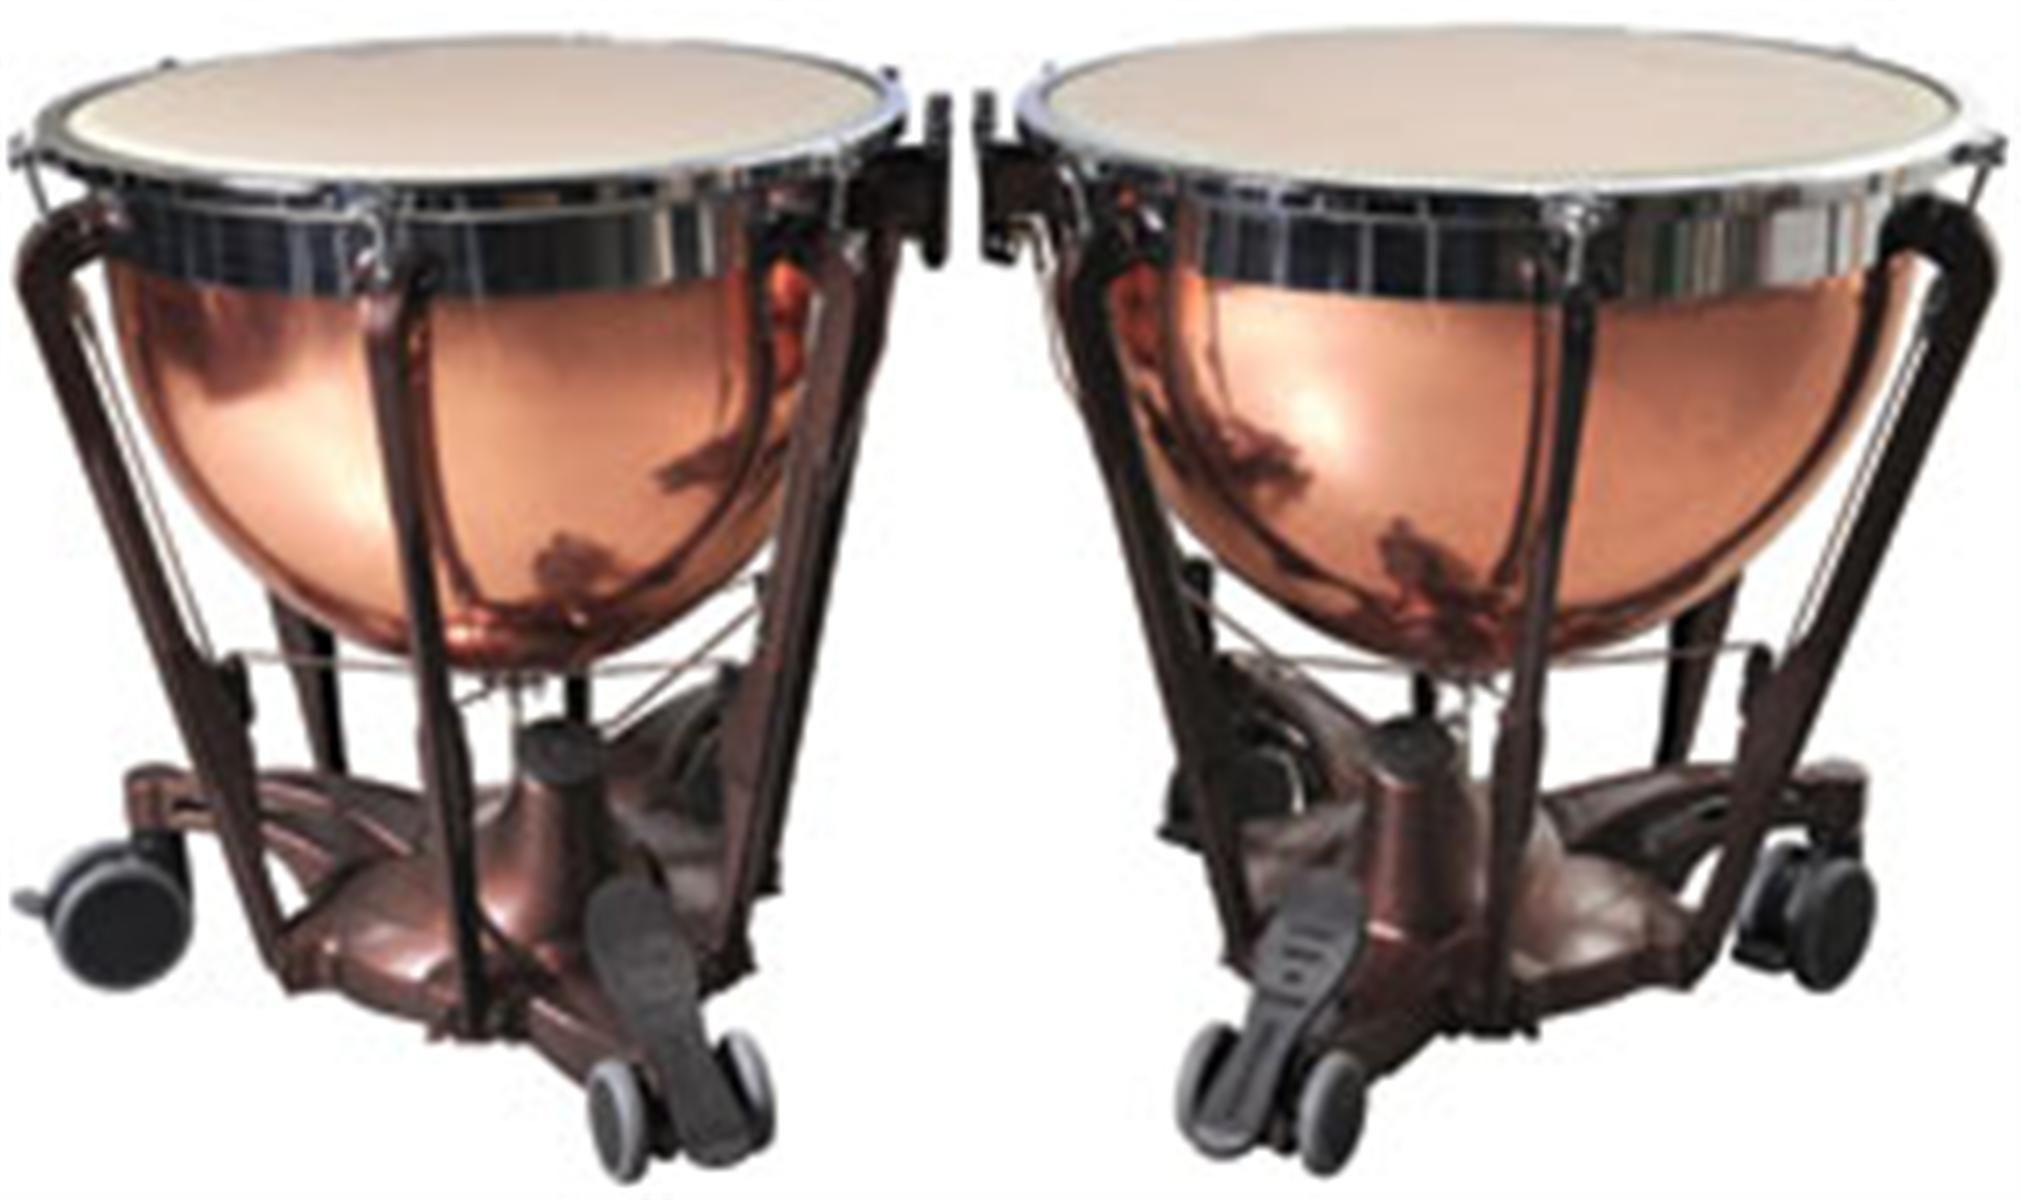 Adams Professional Gen II Smooth Copper Timpani Set - 26